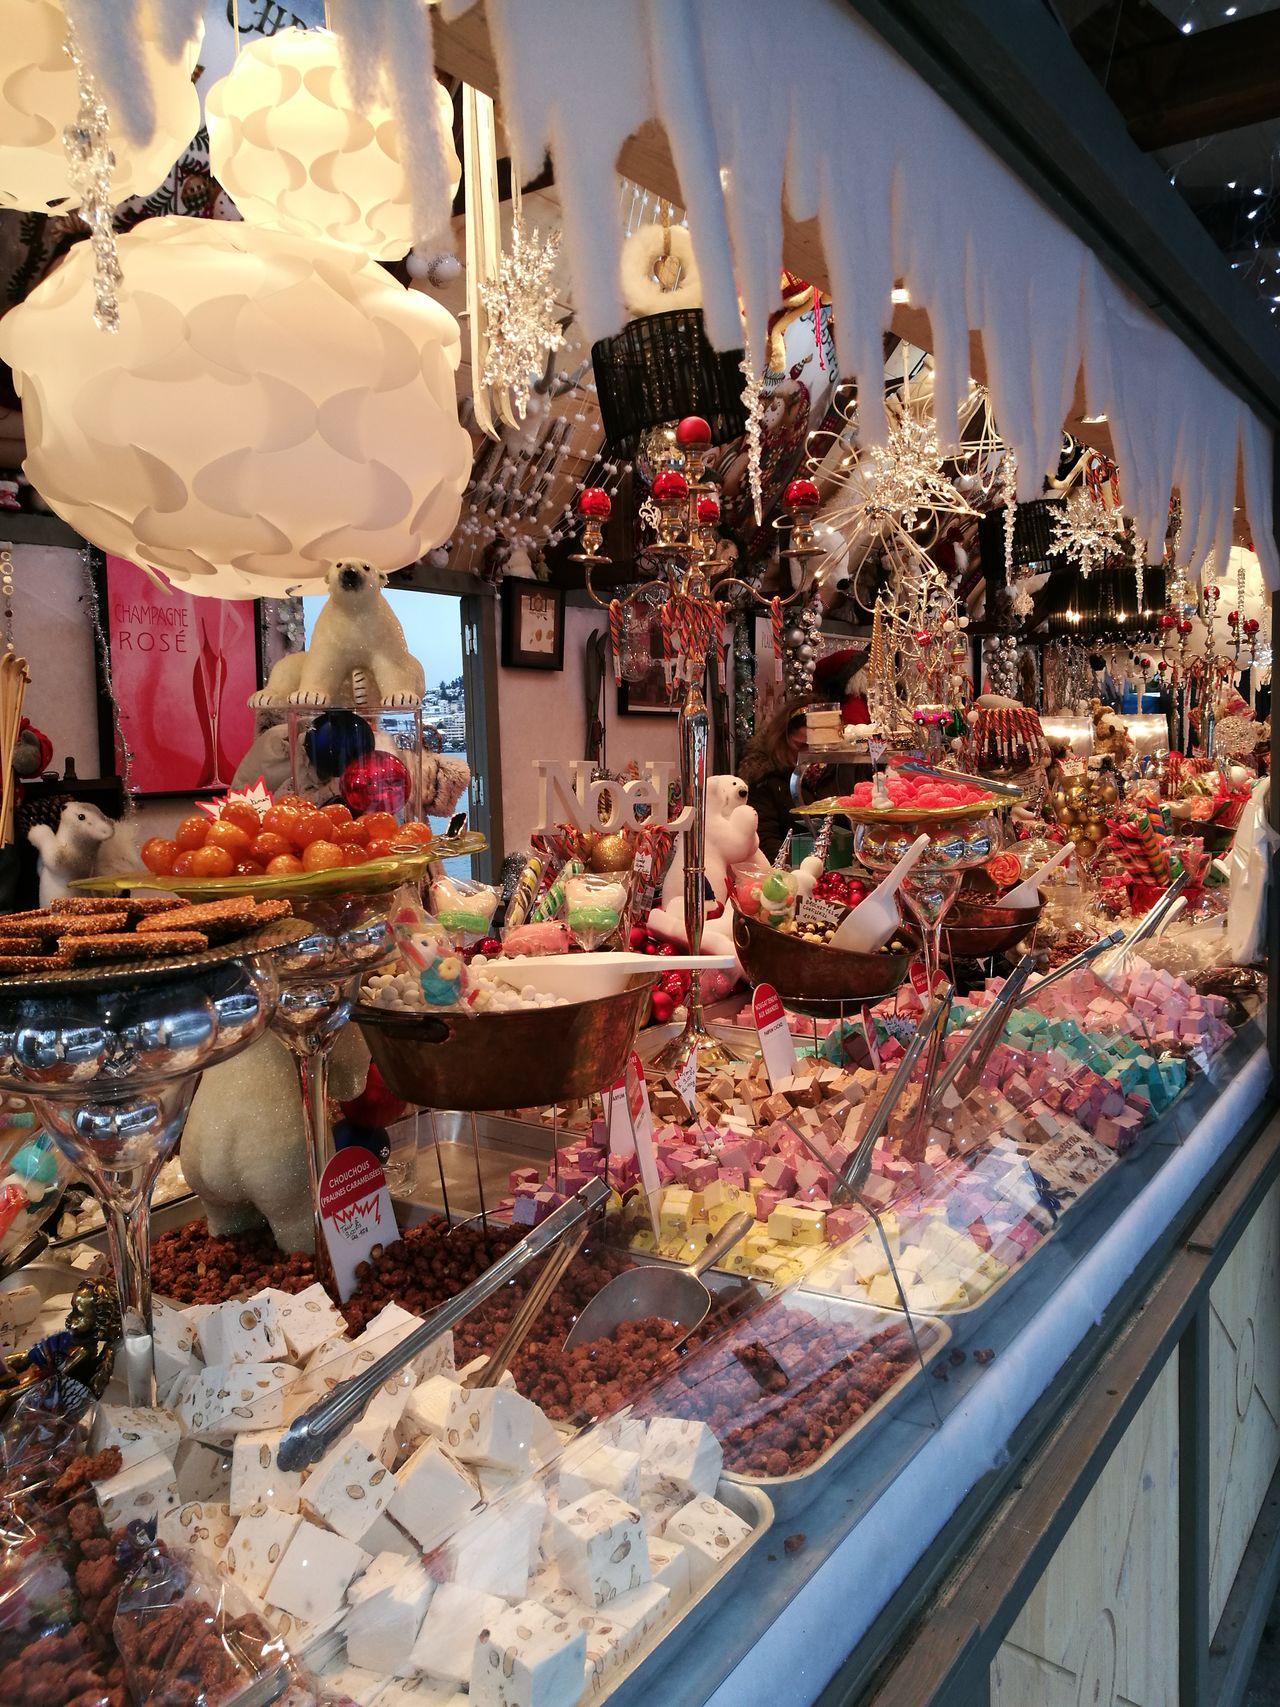 Choice Store Abundance Consumerism Market Sweet Food No People Food Freshness